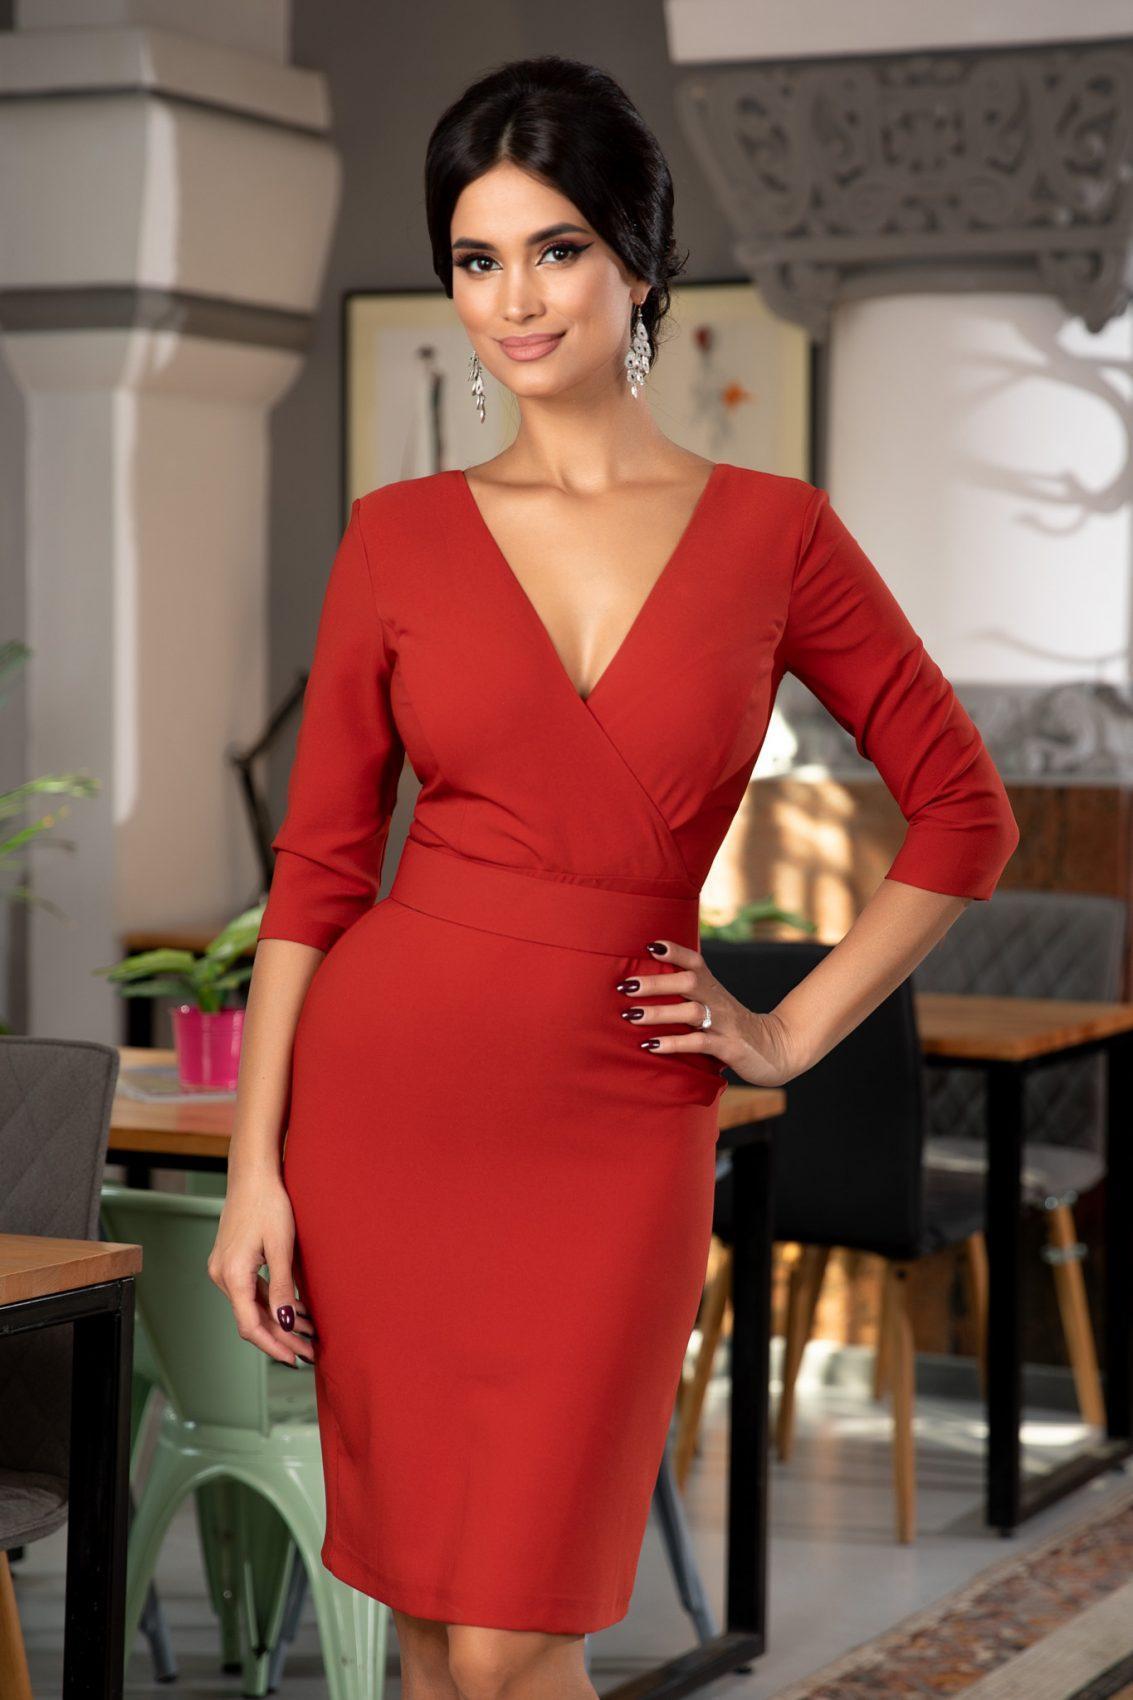 Malvina Bricky Dress